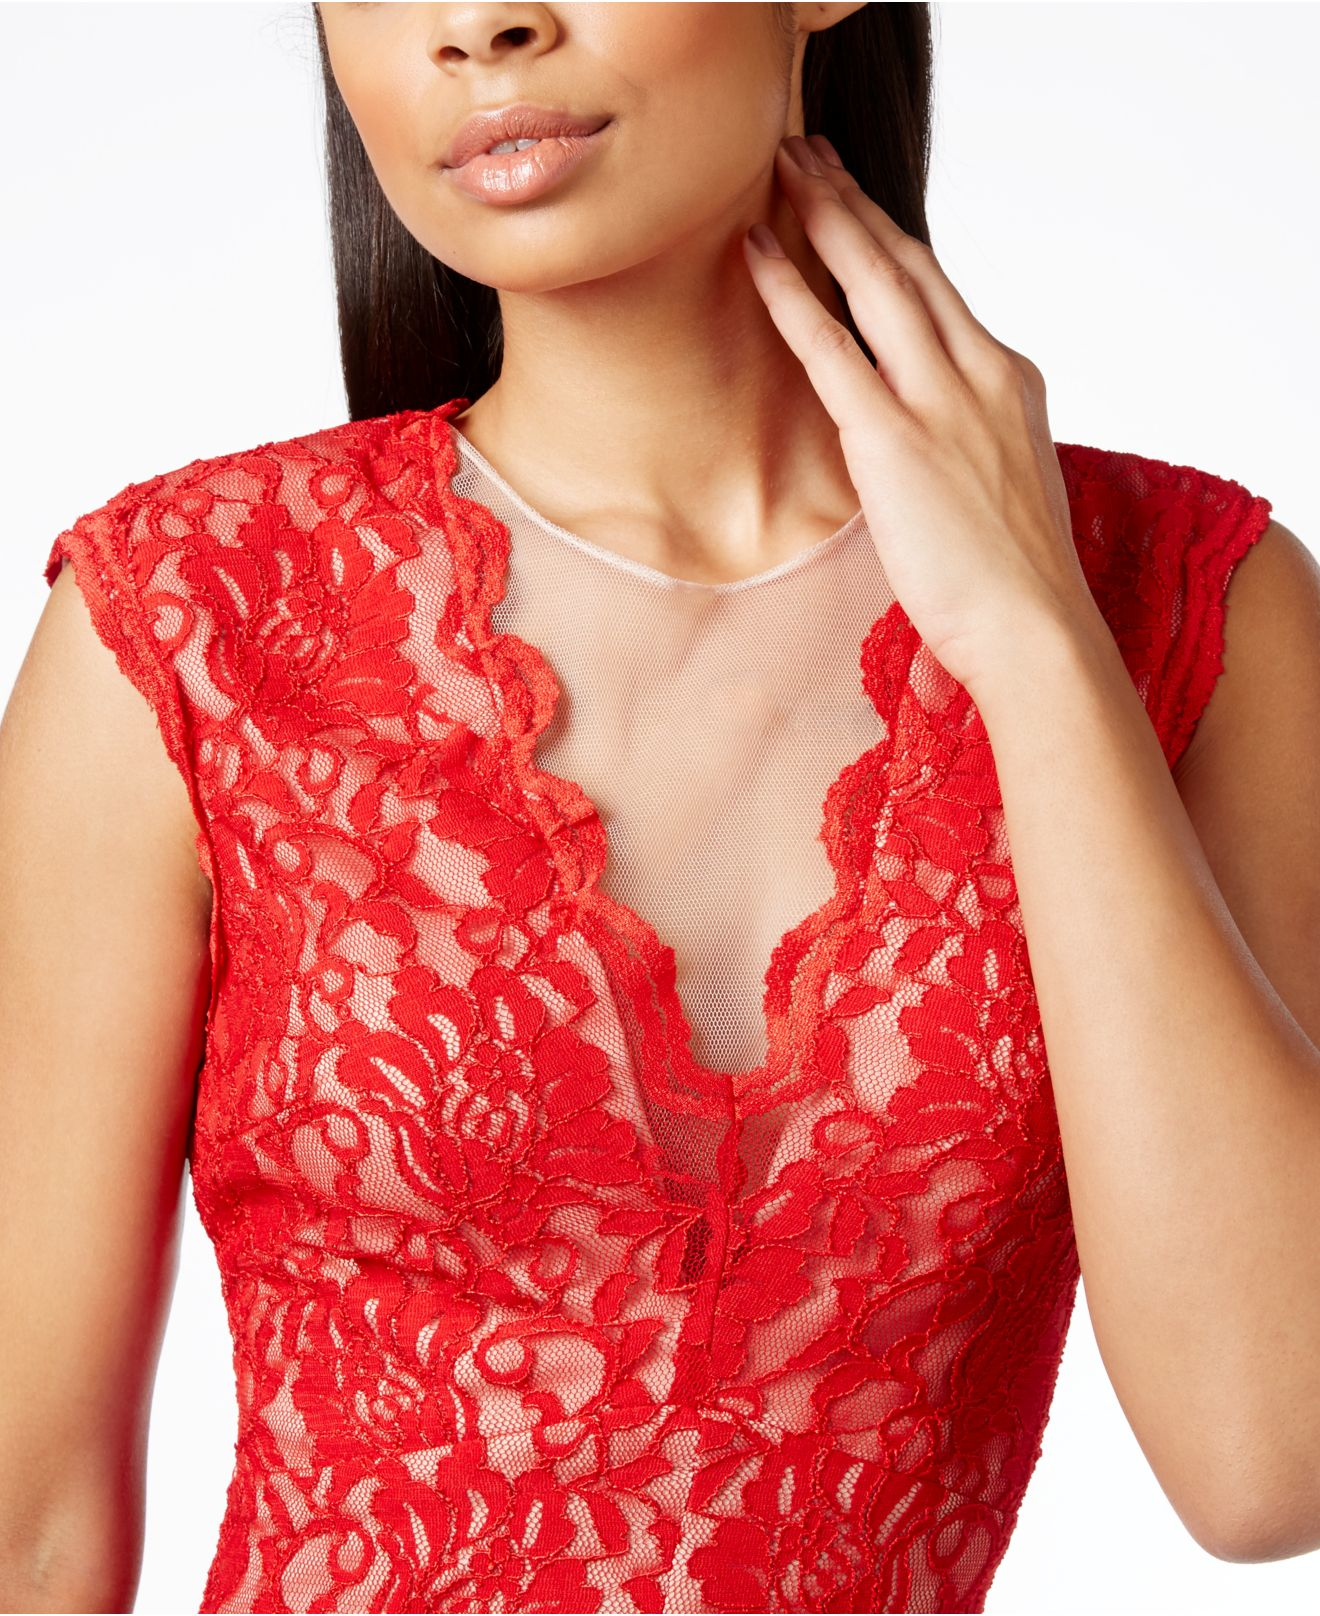 Uncategorized Xscape Dresses Gold Best Xscape Embroidered Sheath Dress  Regular U Petite Nordstrom Picture Of Dresses